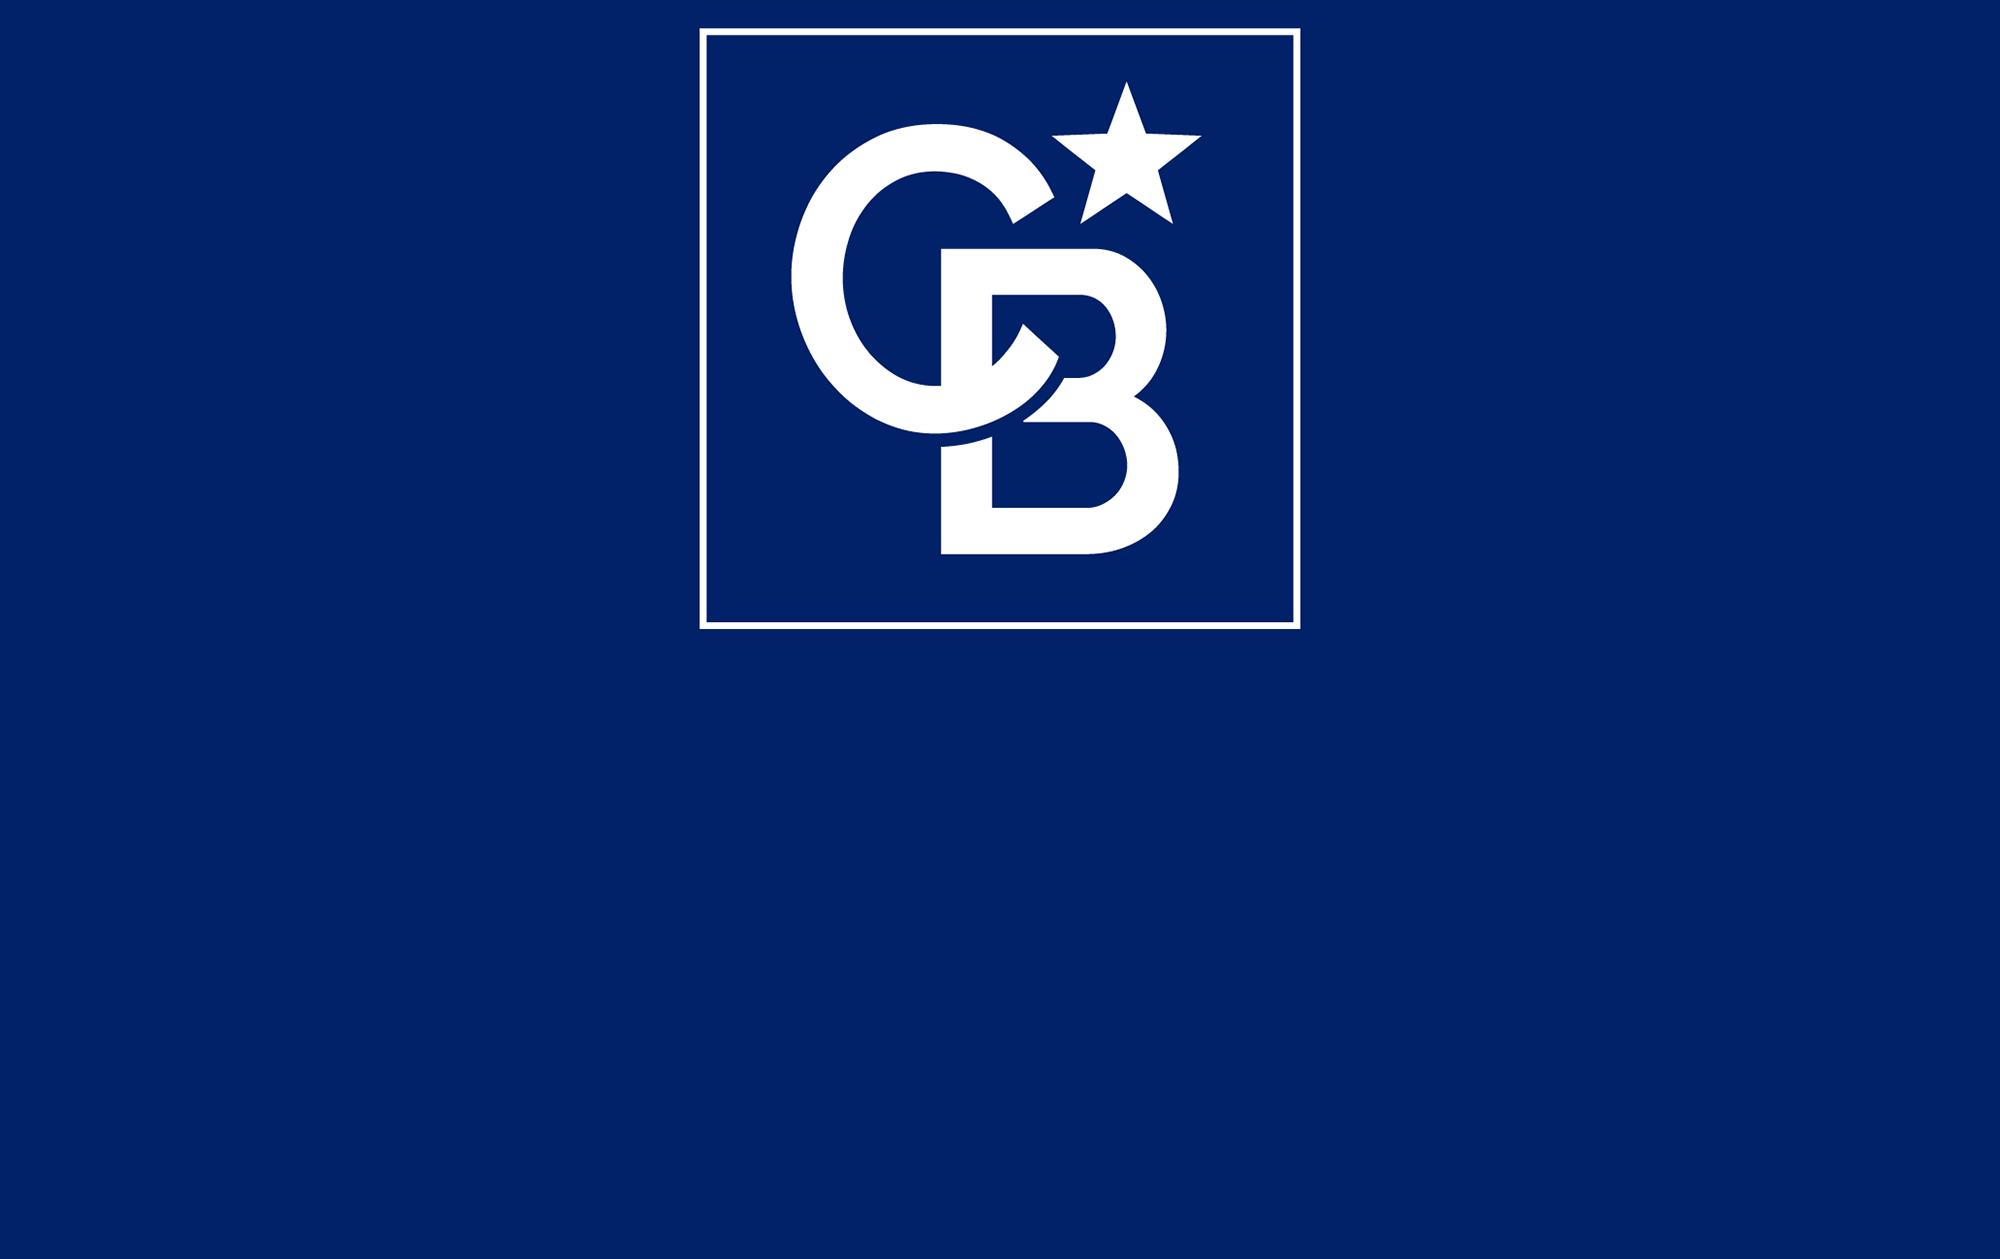 CBHB01 Logo